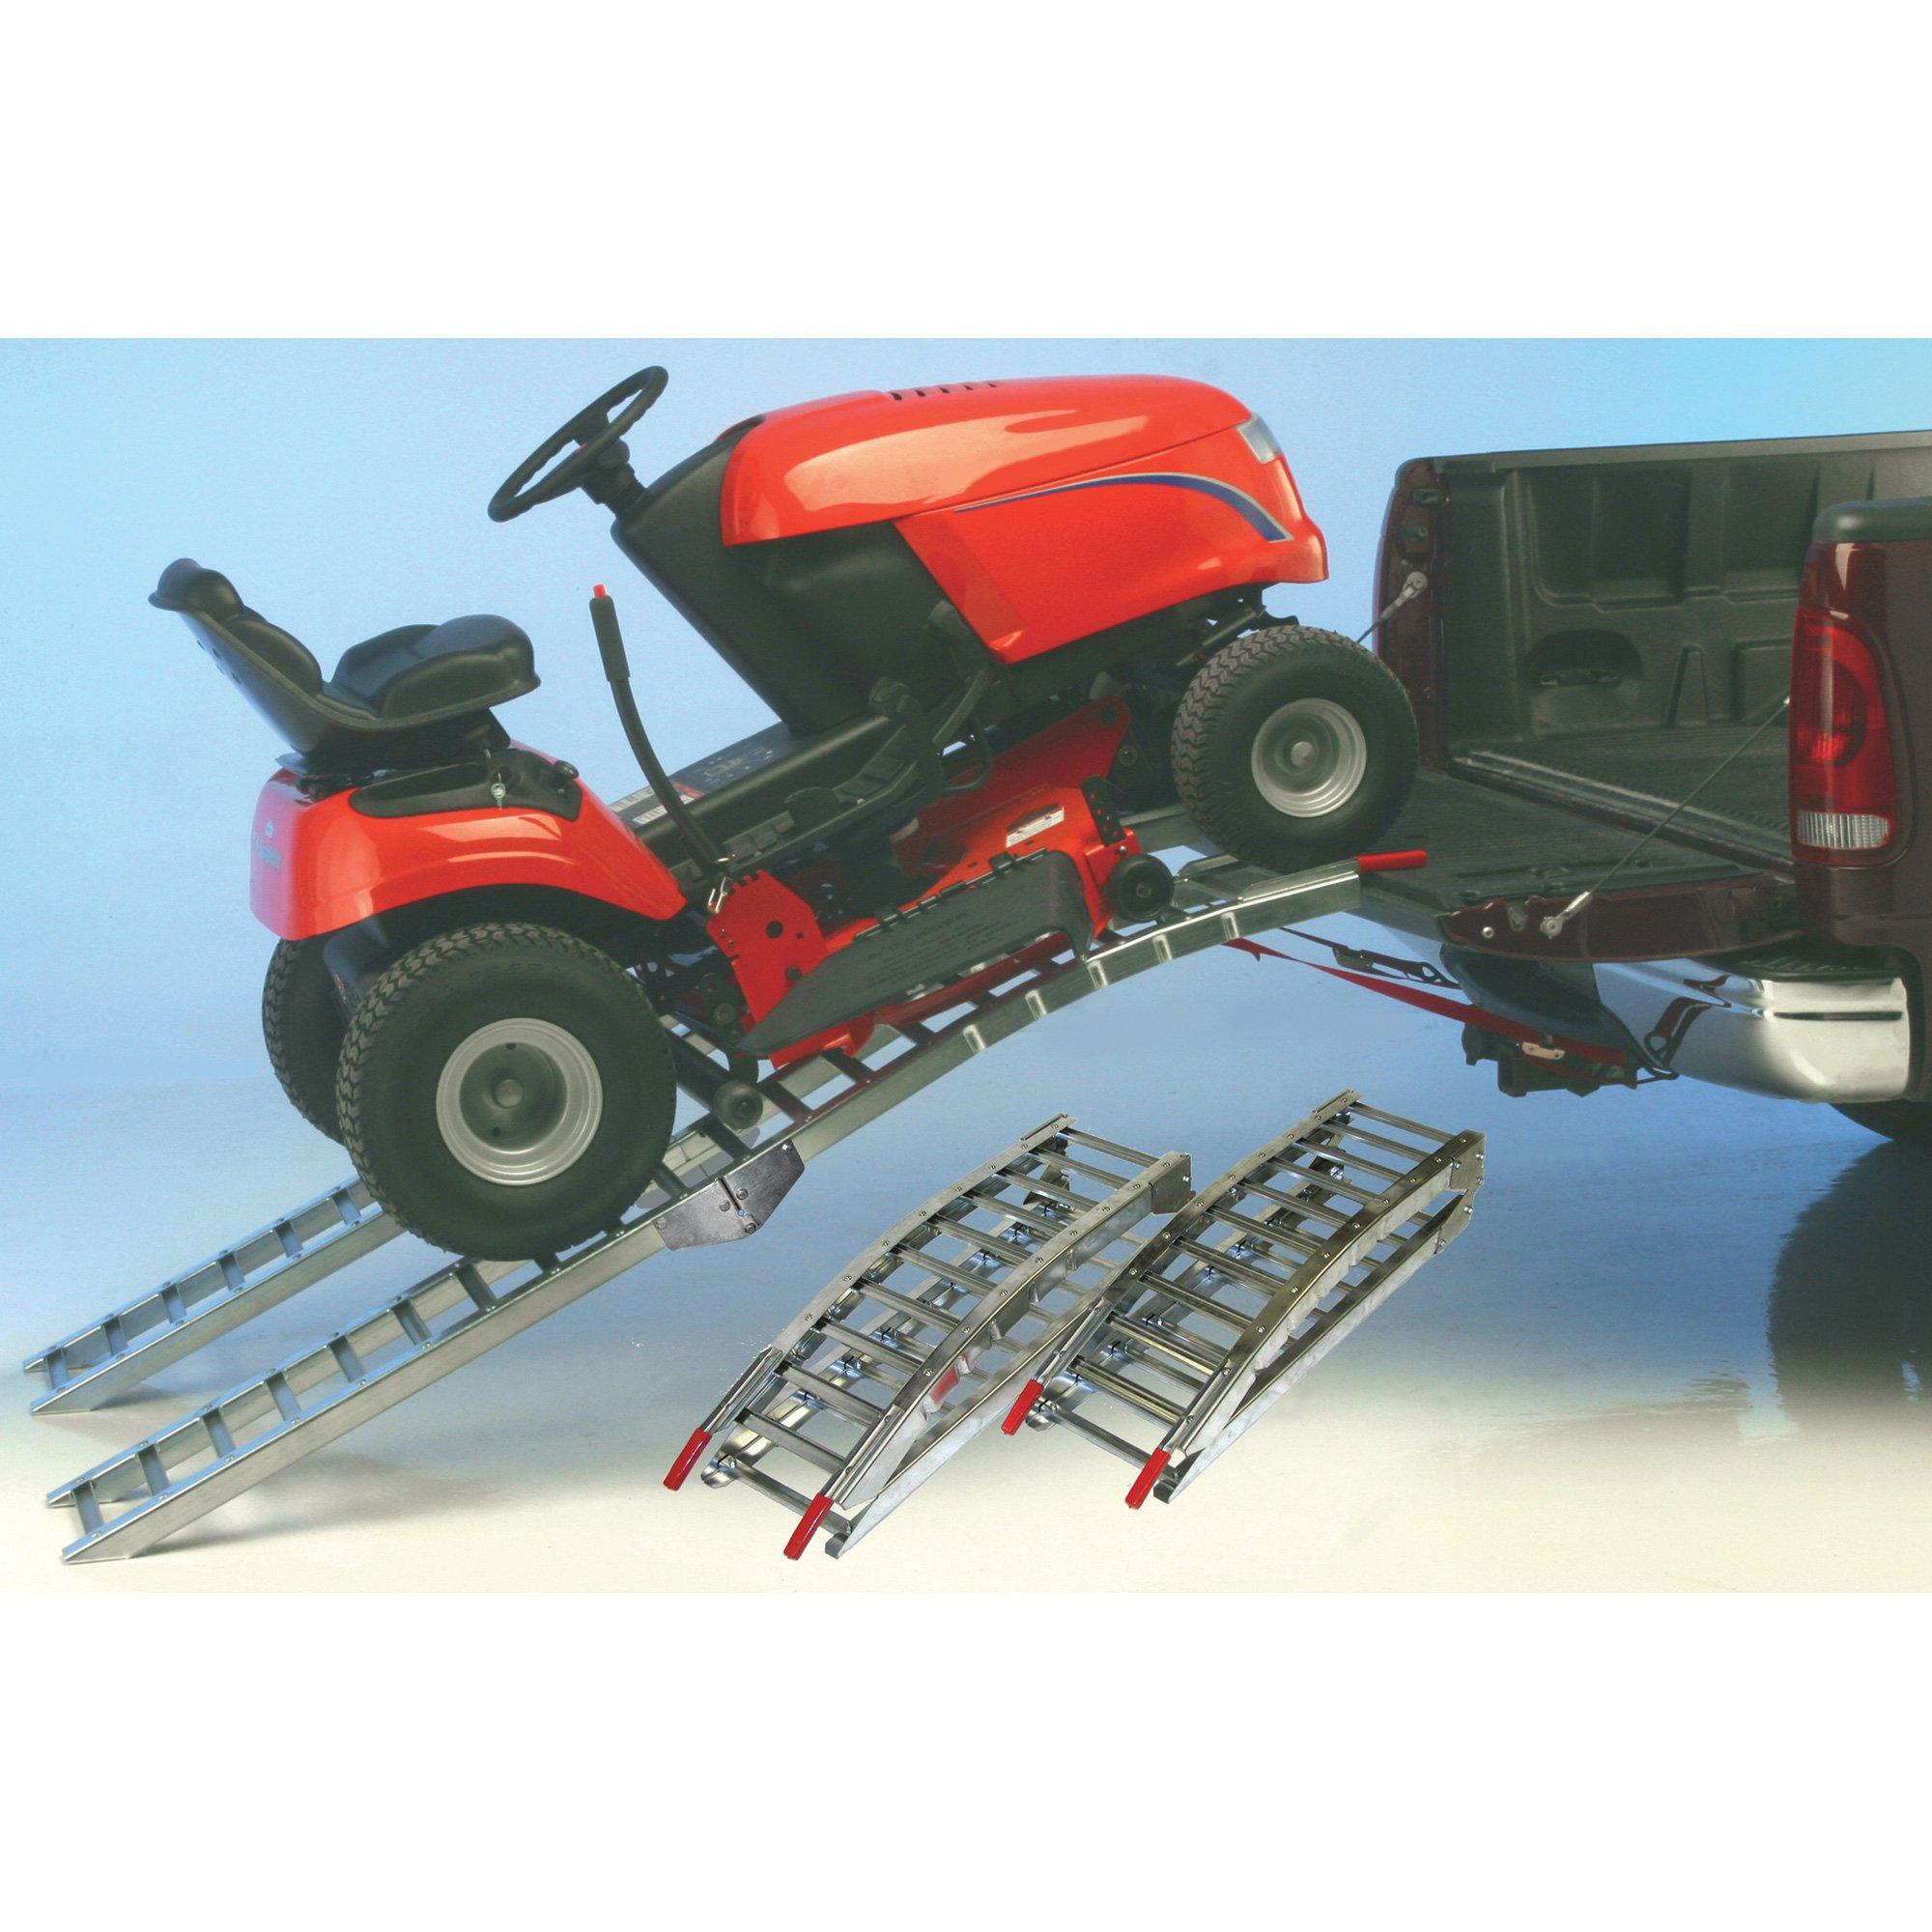 West Folding Arched Hybrid Ramp Set- 1,400-Lb. Capacity, 7ft.L, Model# 1224